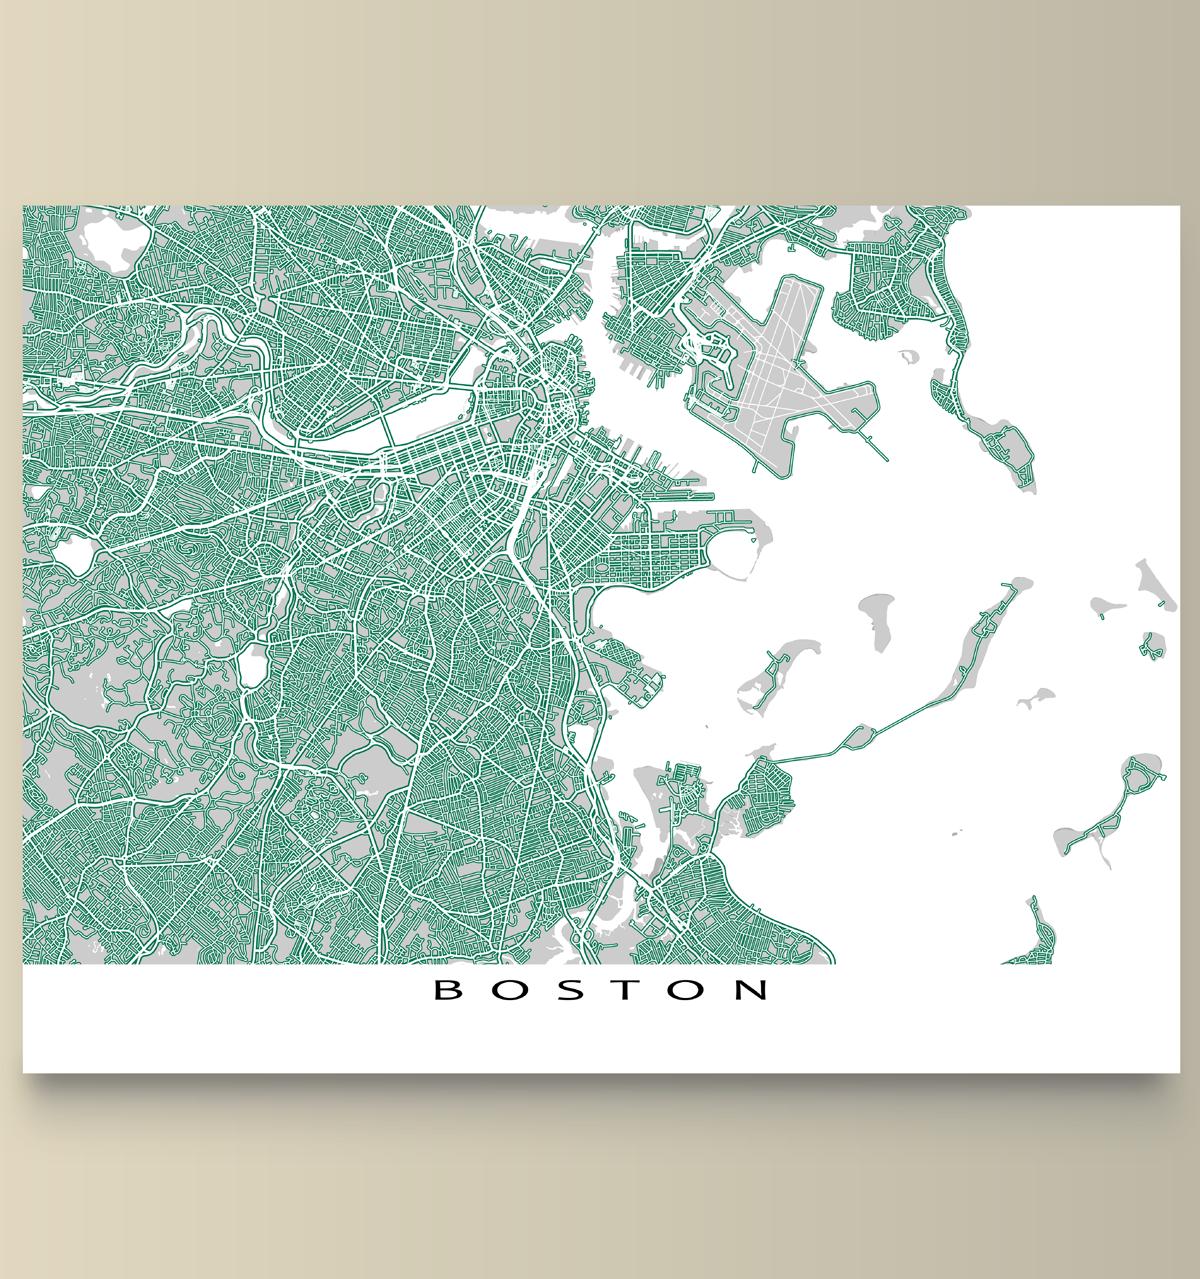 Boston Map Print Massachusetts USA Roads Massachusetts - Boston massachusetts us map